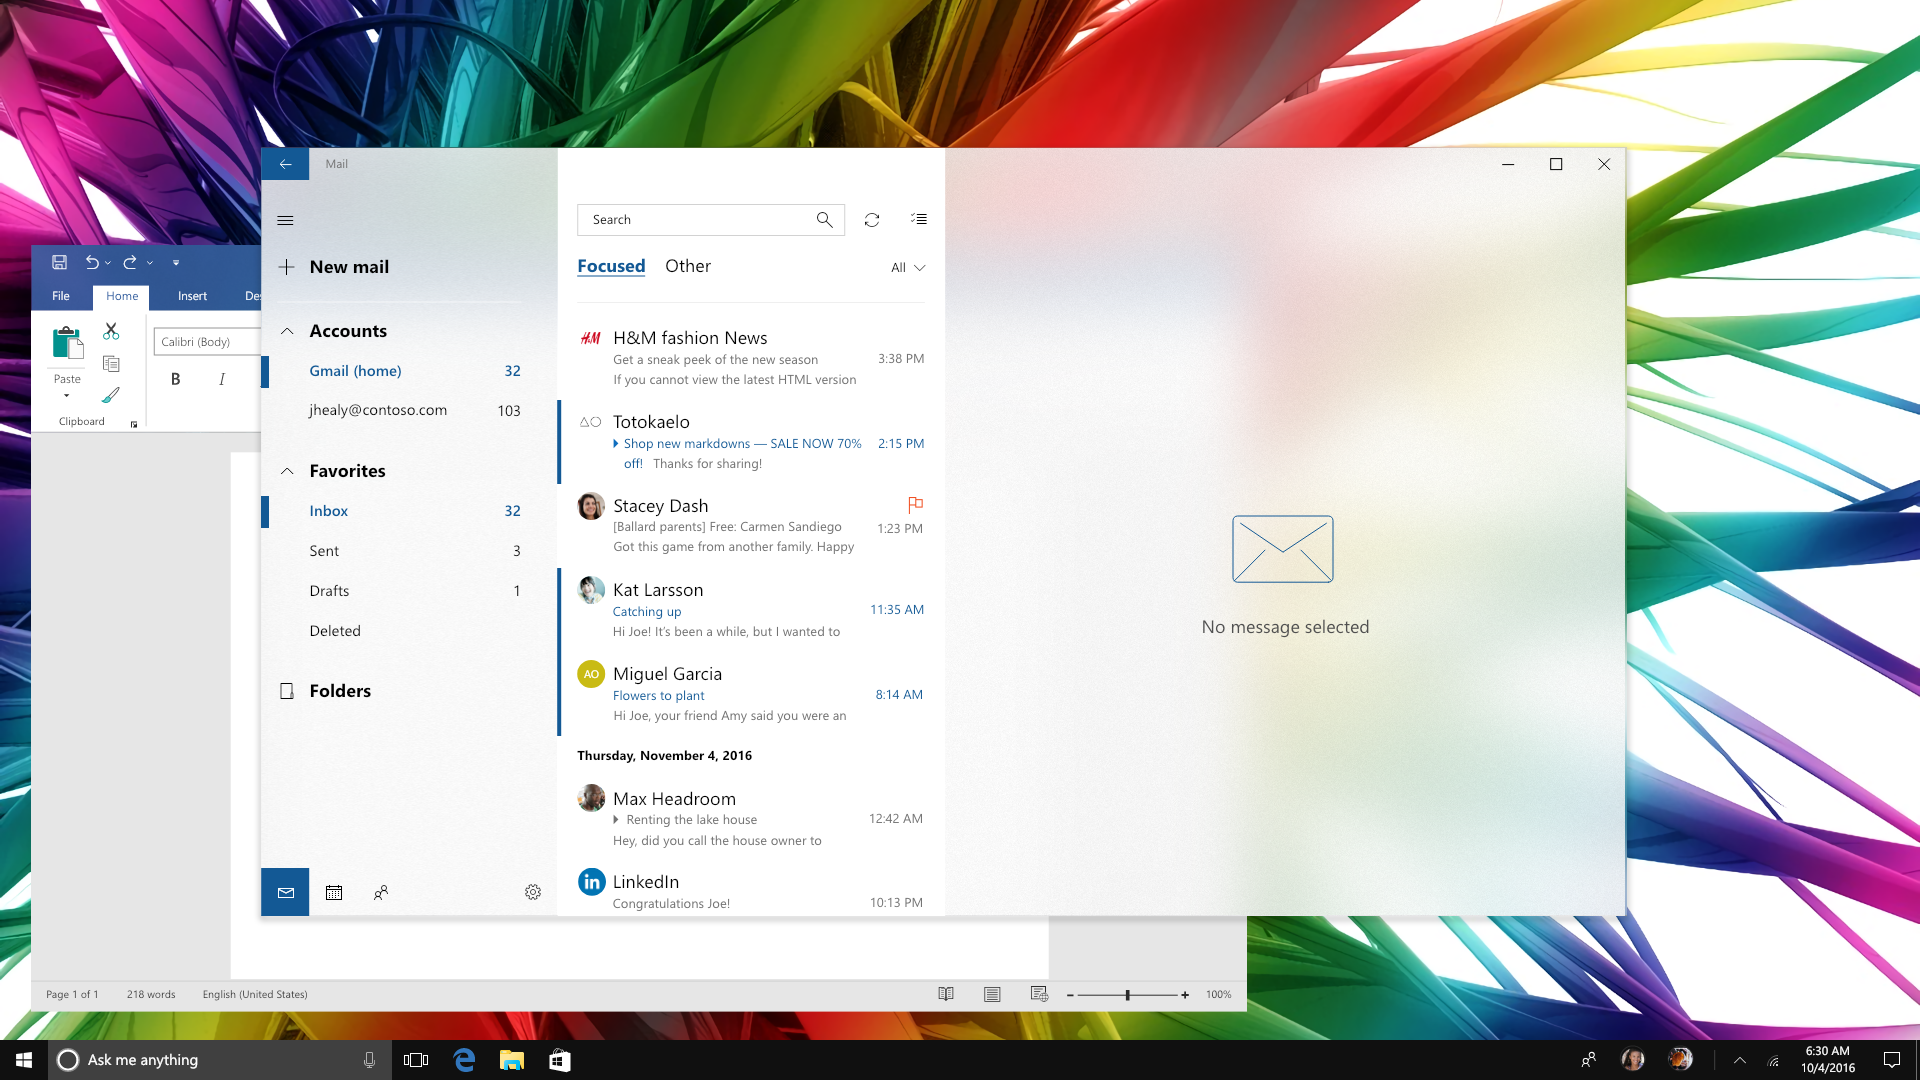 Digital Design Is Never Done Evolving Windows 10 Mail And Calendar